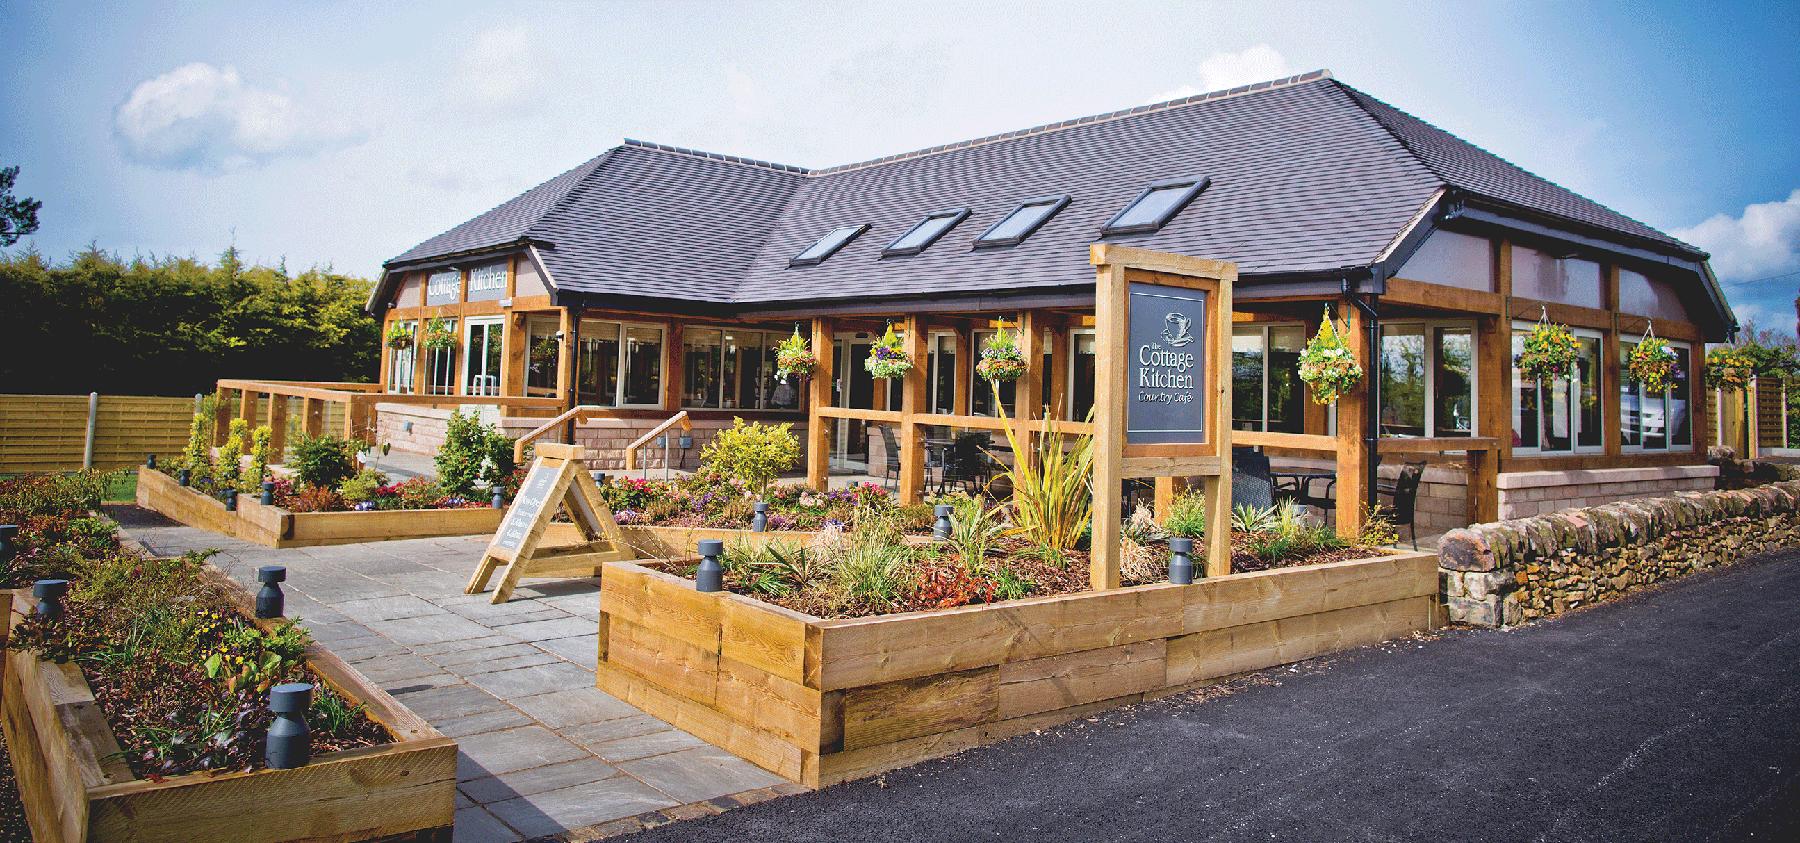 The Cottage Kitchen Country Café